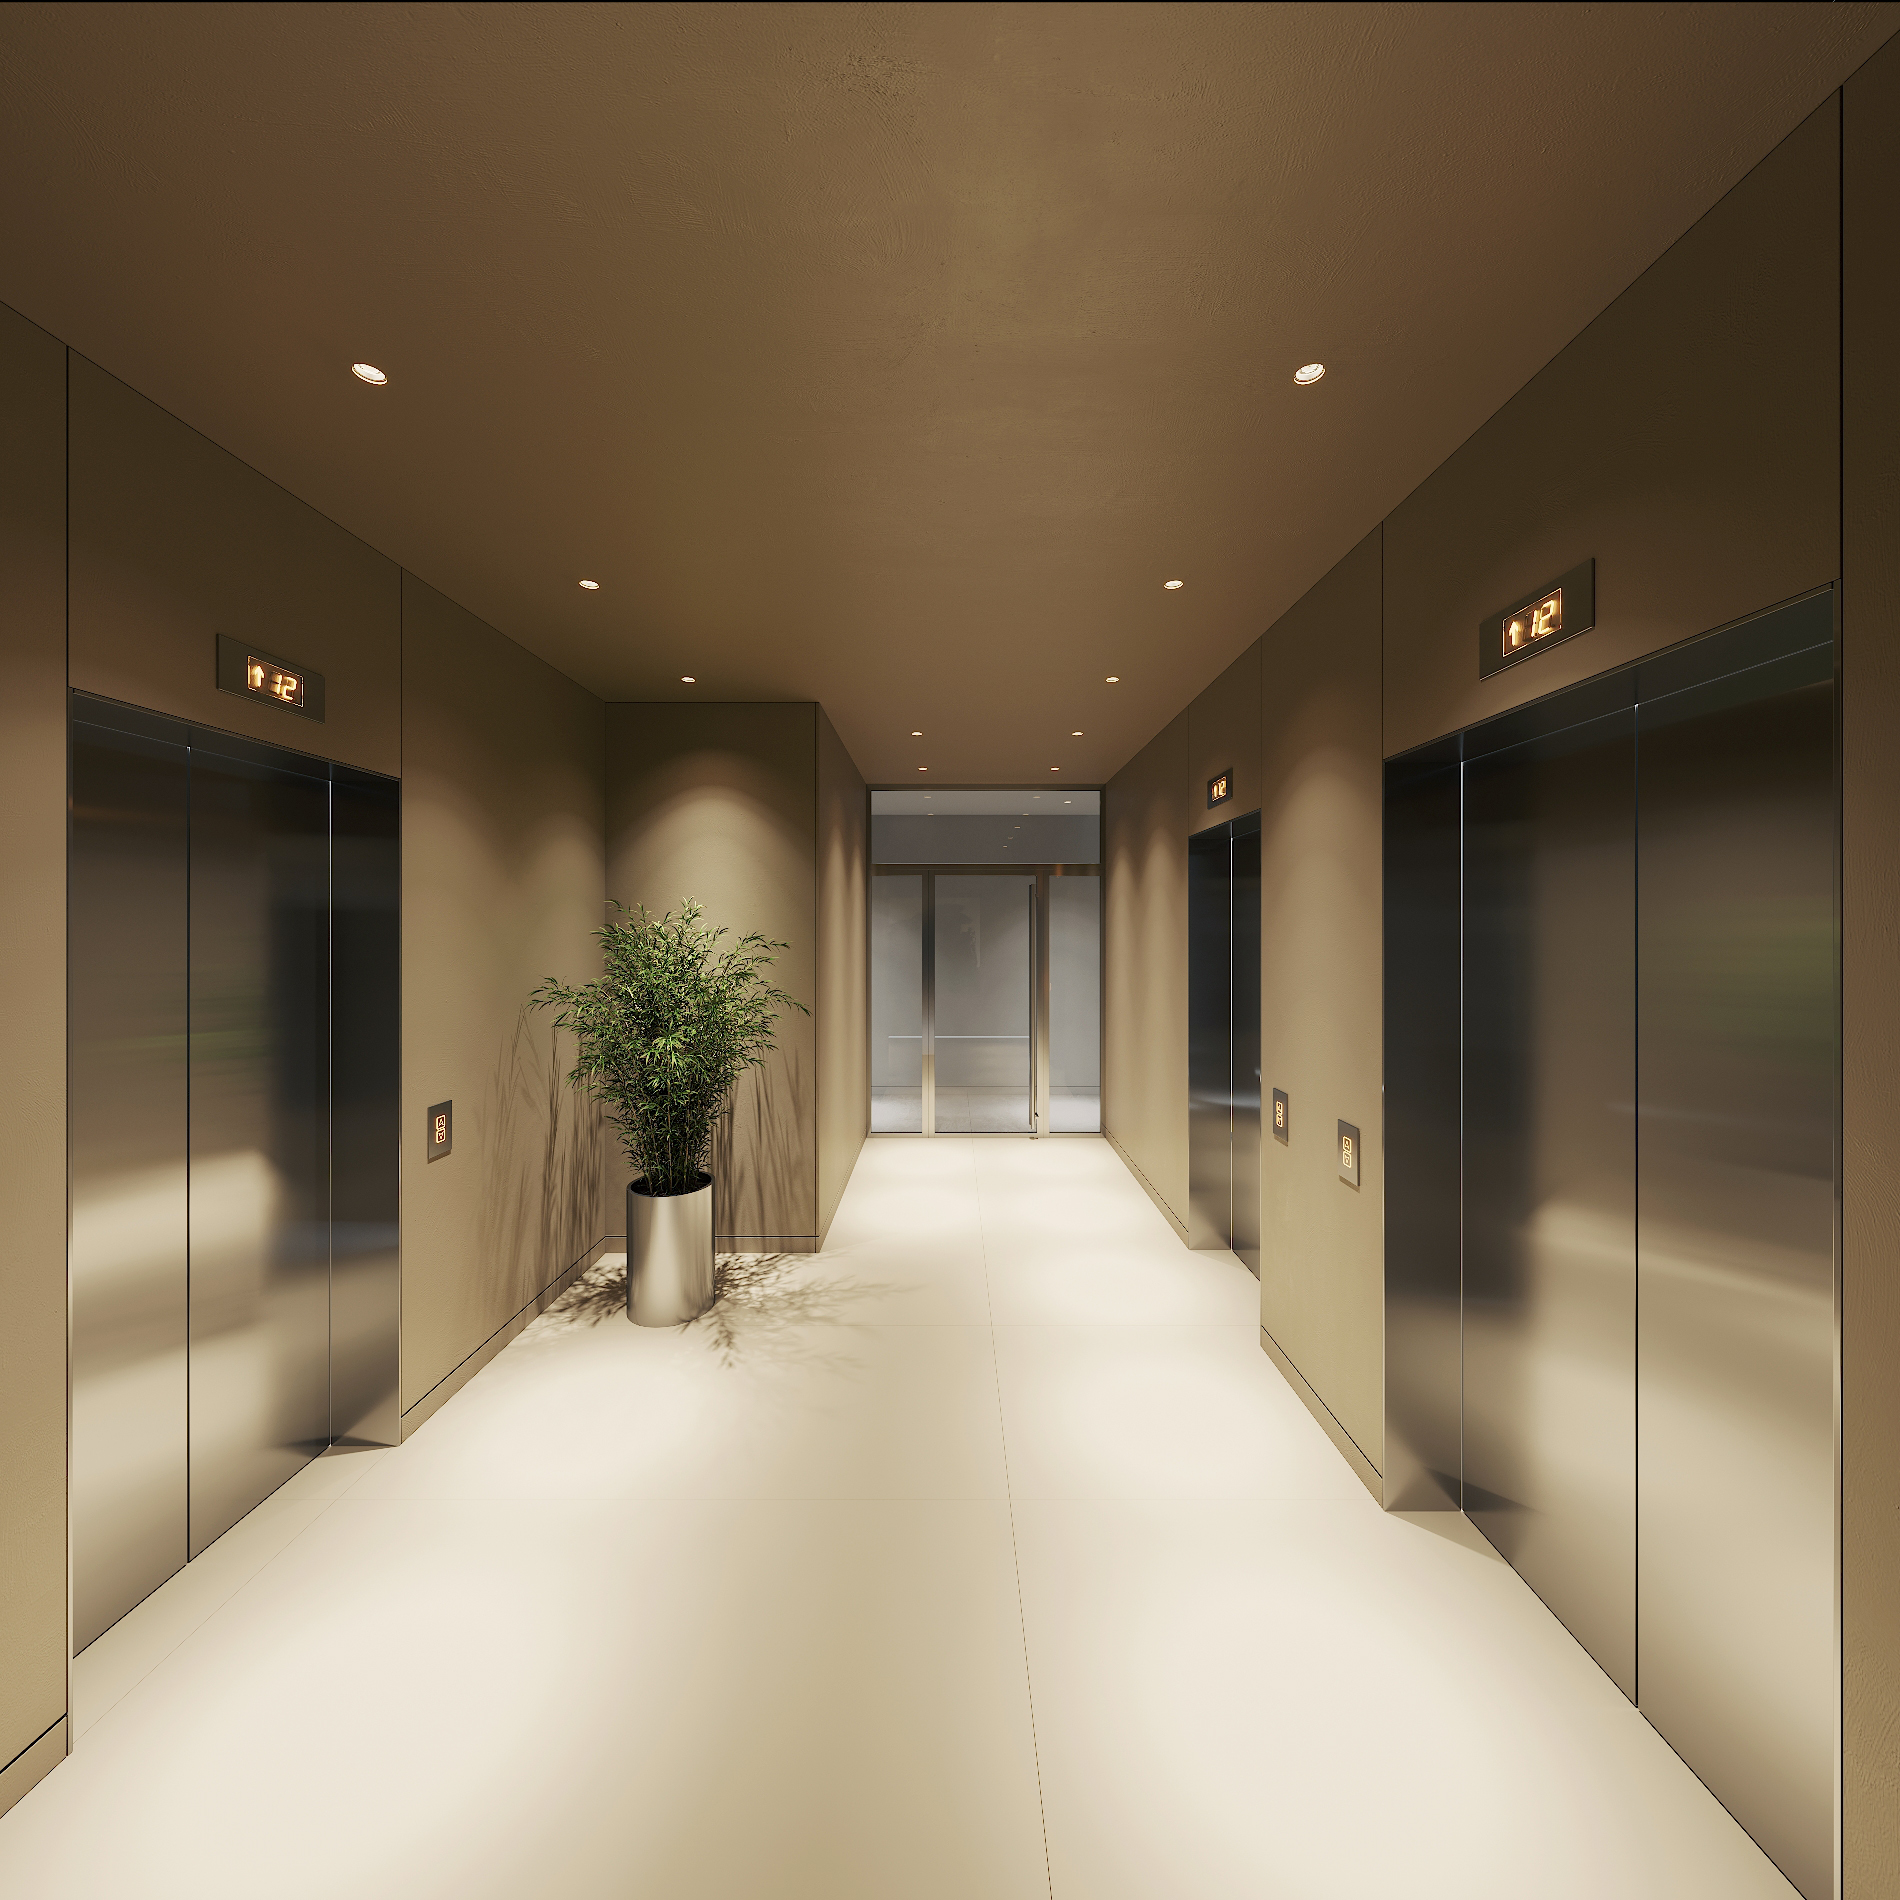 Hillfort Business Mansion 1814 MYCHAILIVSKA 2 floor. Lift hall